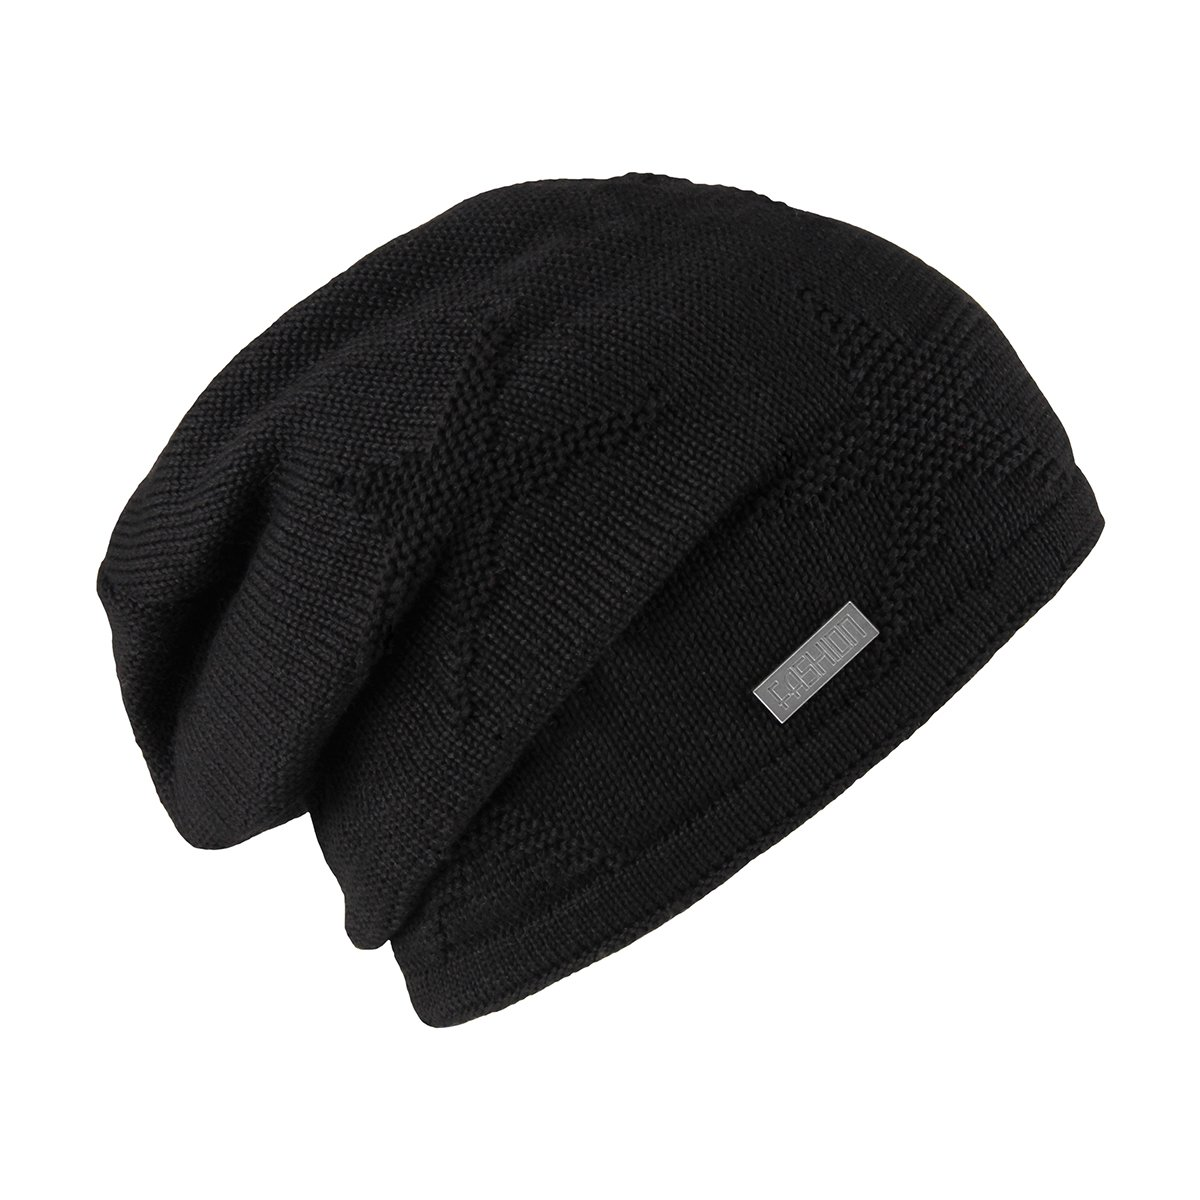 8e87a676e5f548 OMECHY Winter Knit Slouchy Beanie Hat Unisex Daily Warm Ski Skull Cap, Black